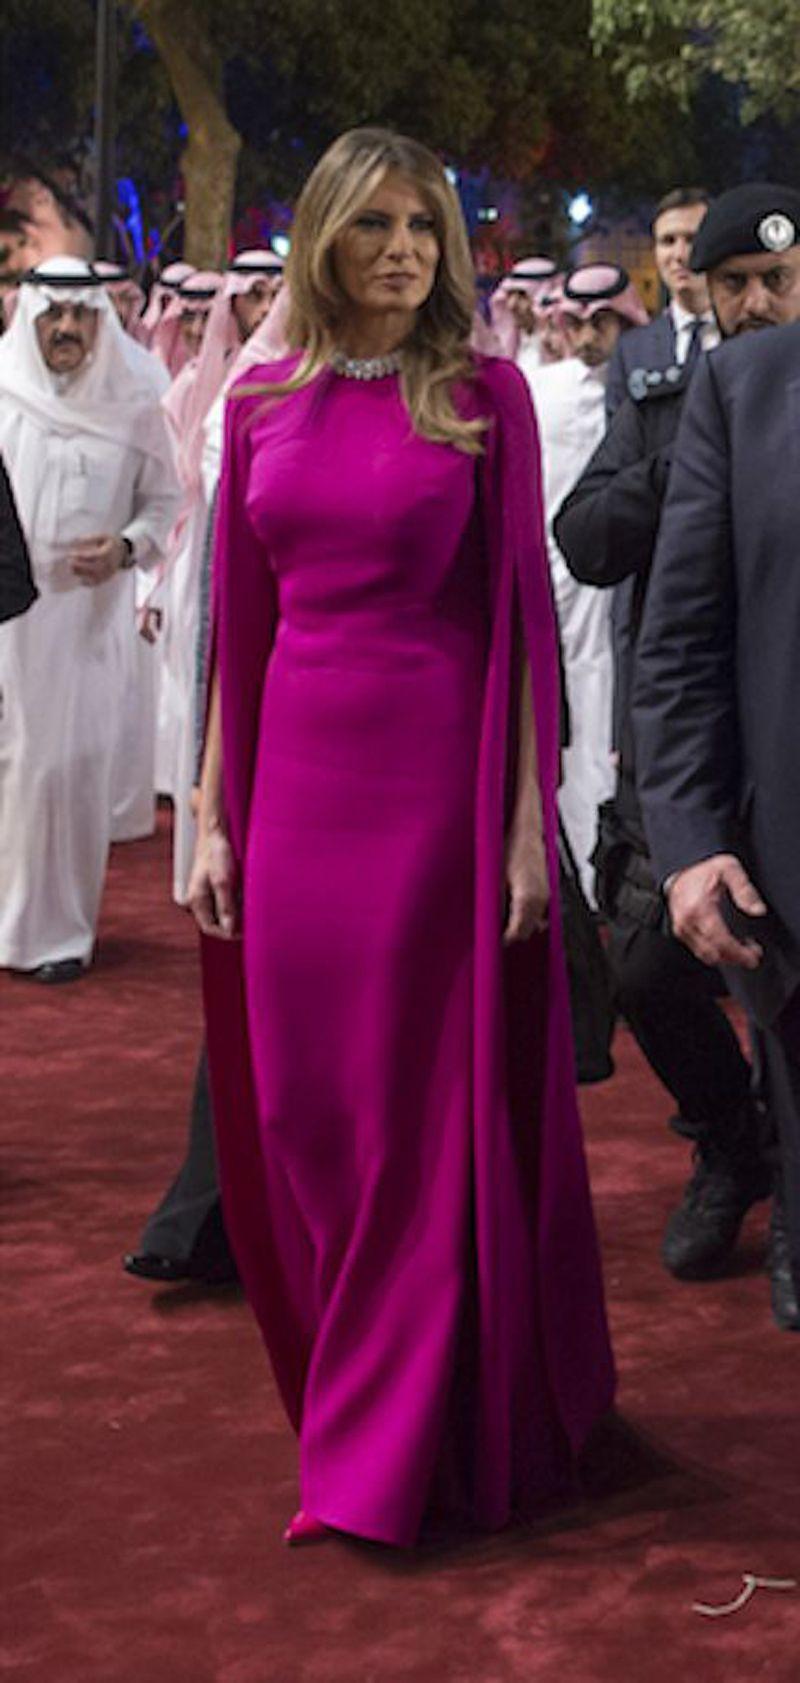 Melania Trump Same Evening Dress Saudi Arabia Elegant Respectful' Tour Outfits Floor Length Formal Dress with Long Wrap